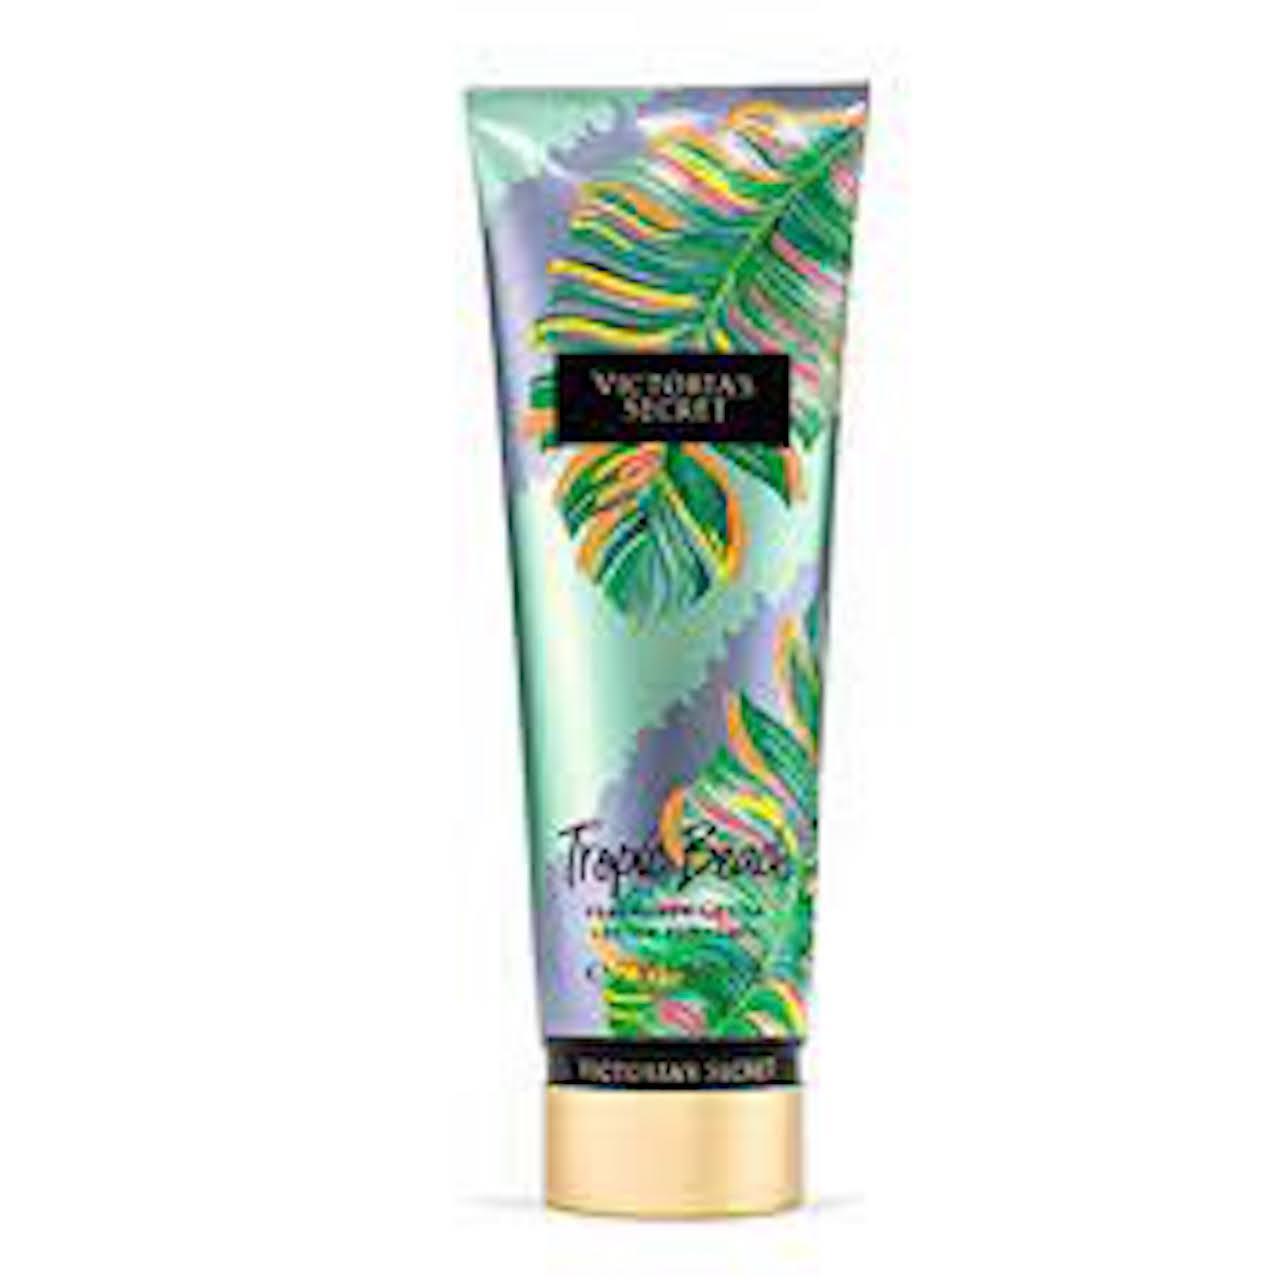 Dưỡng thể giữ ẩm da Victoria's Secret Fragrance Lotion Tropic Beach 236ml (Mỹ)